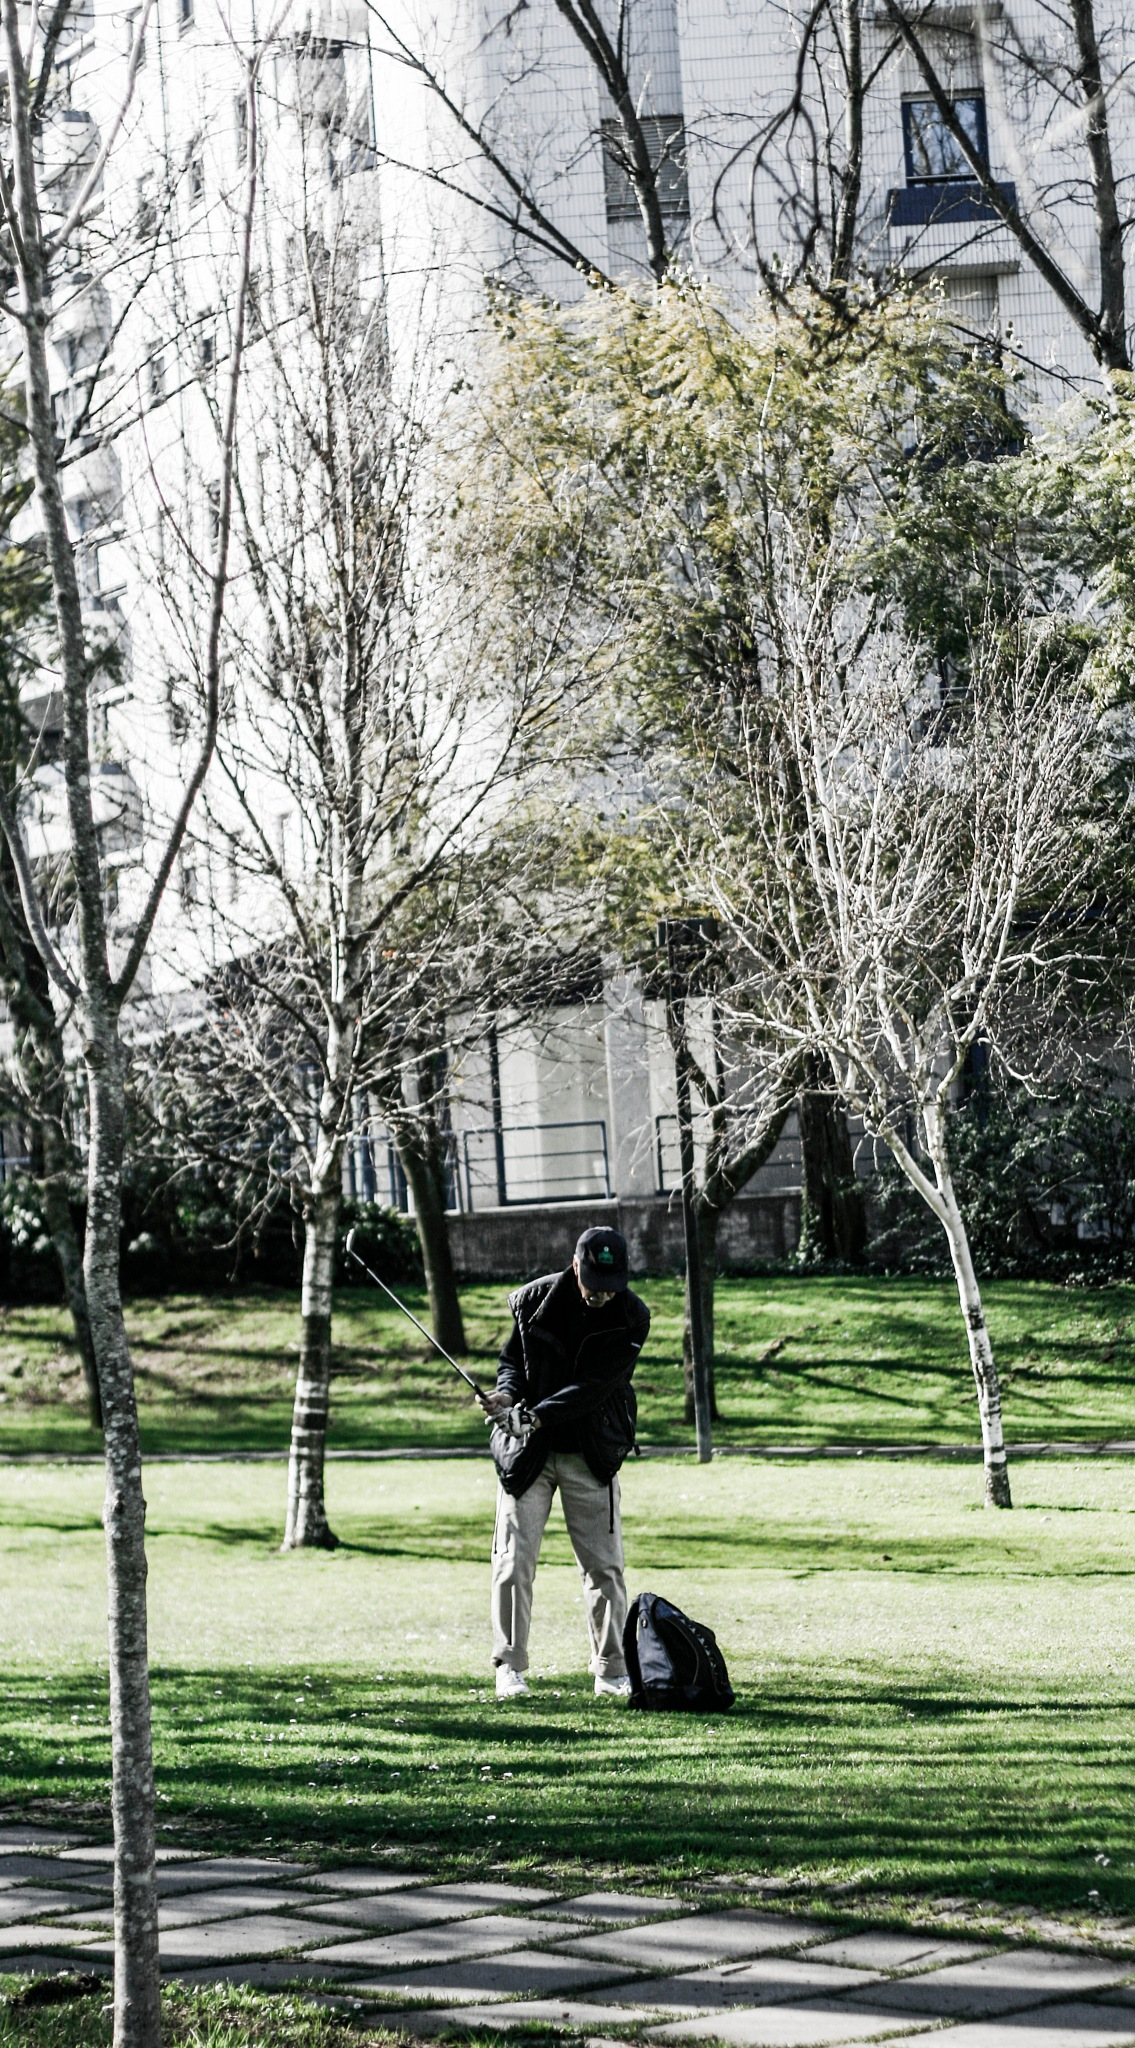 the street golfer by Giorgio_ourmoney